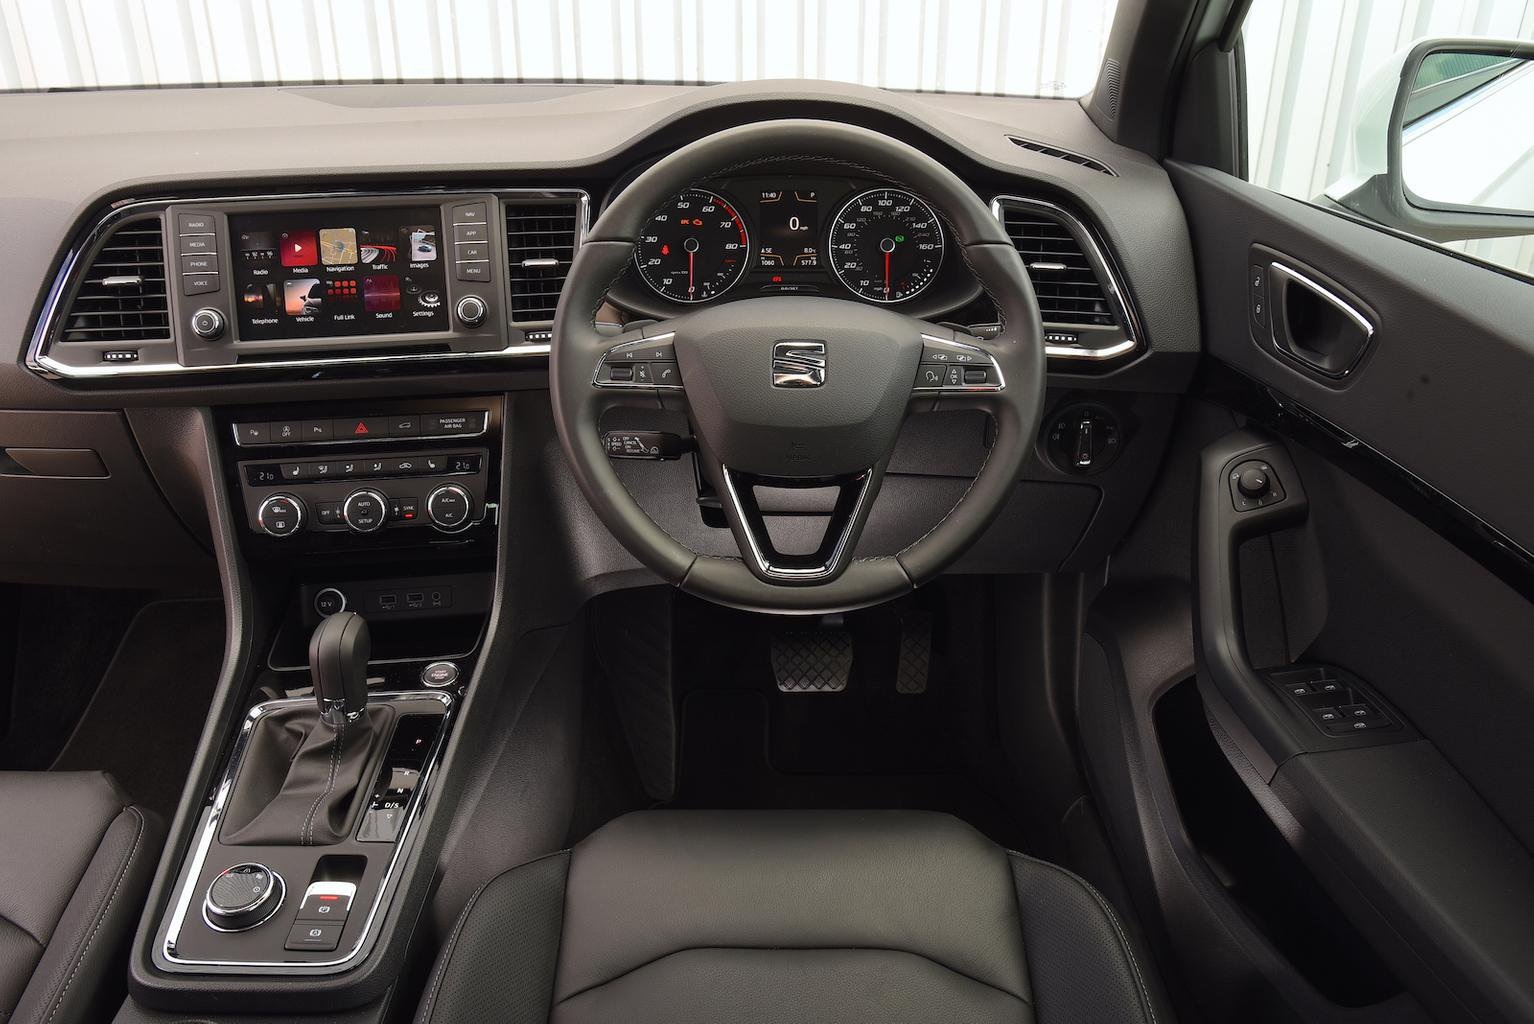 Seat Ateca 1.4 TSI DSG 2017 review